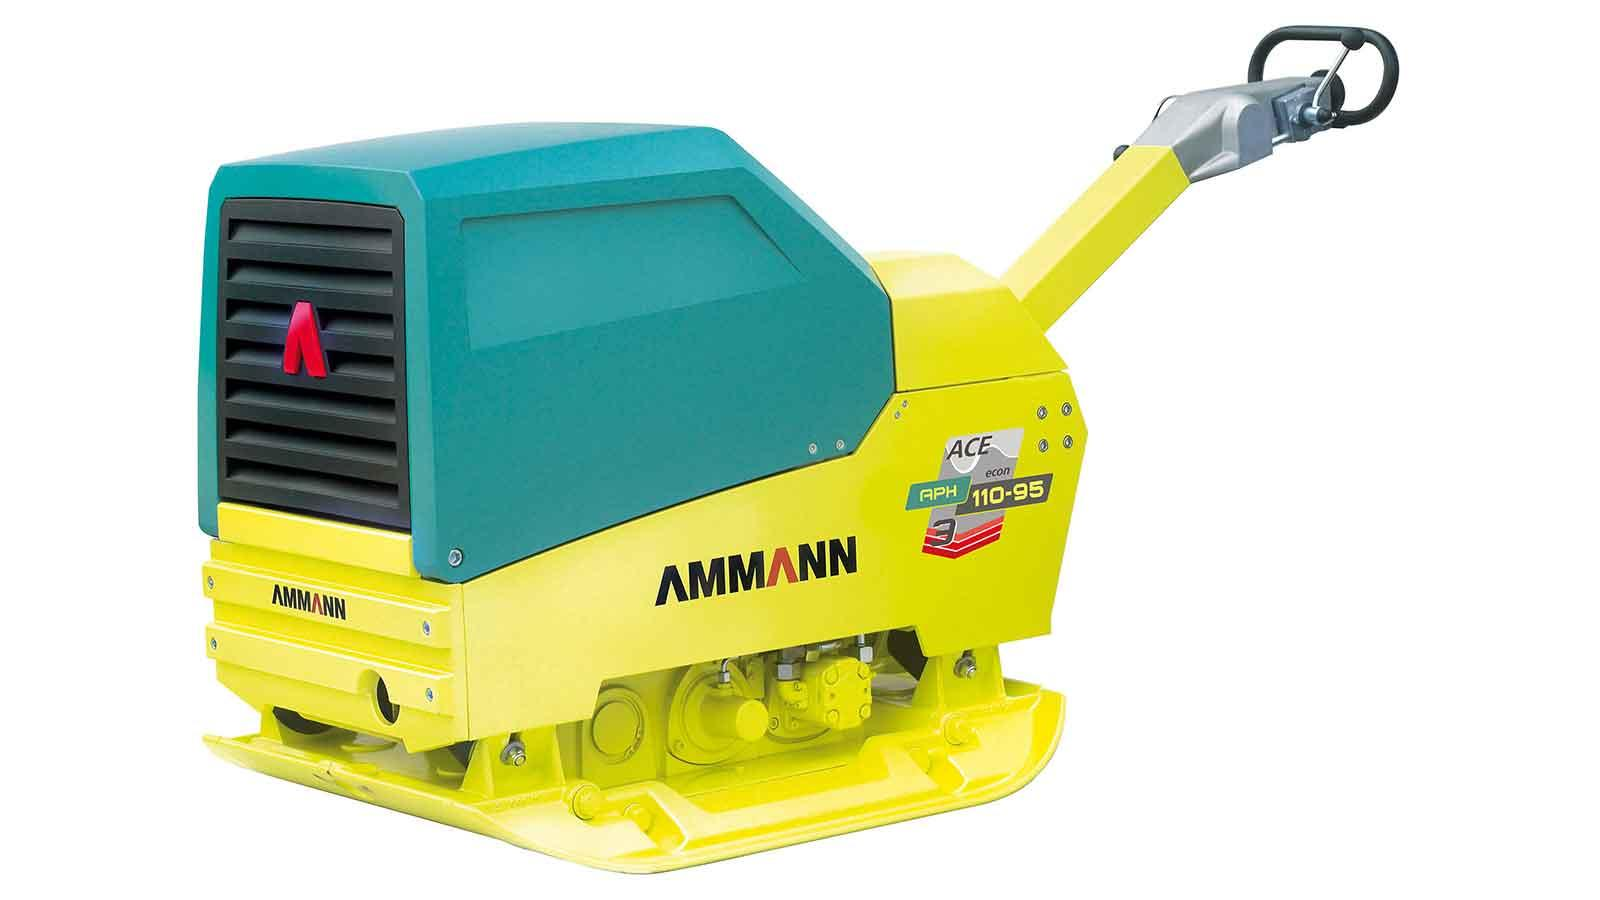 Placa compactoare reversibila hidrostatica AMMANN APH 110-95